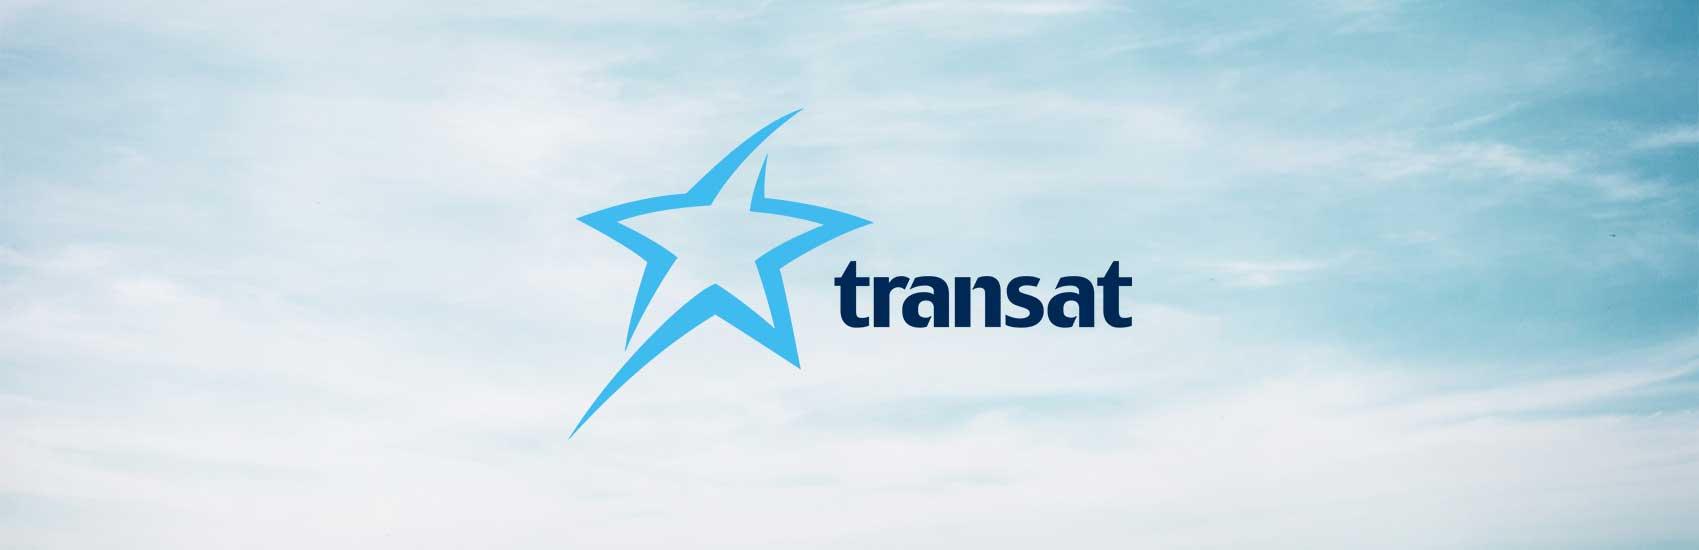 Transat Page EBB 0